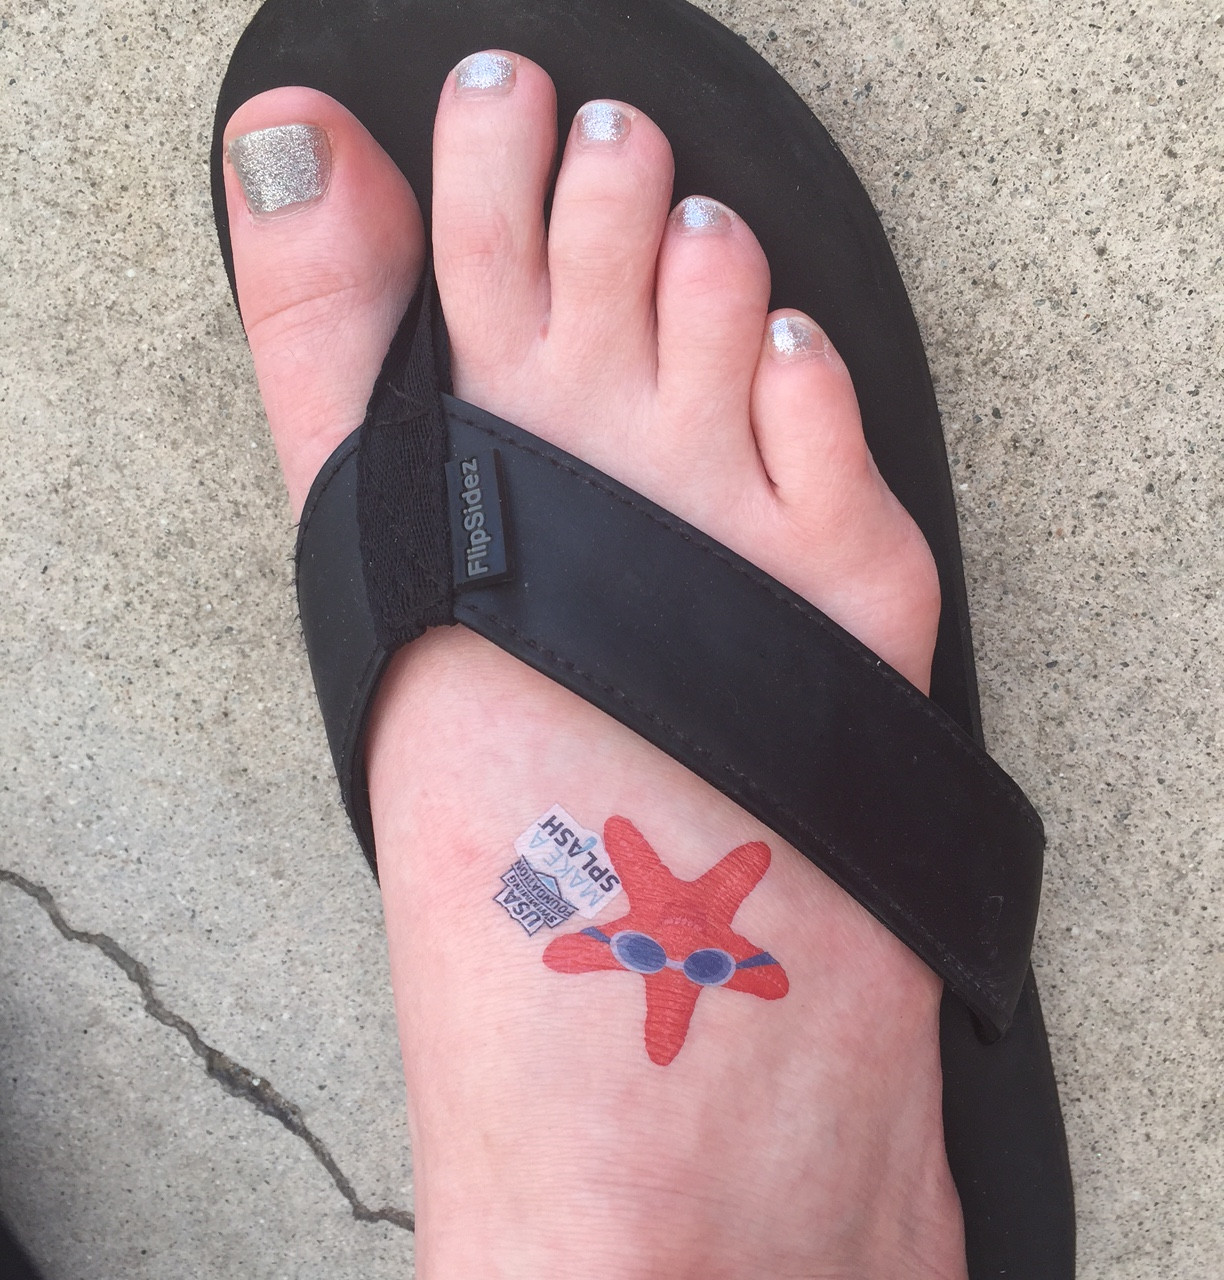 USA Swimming Temporary Tattoo